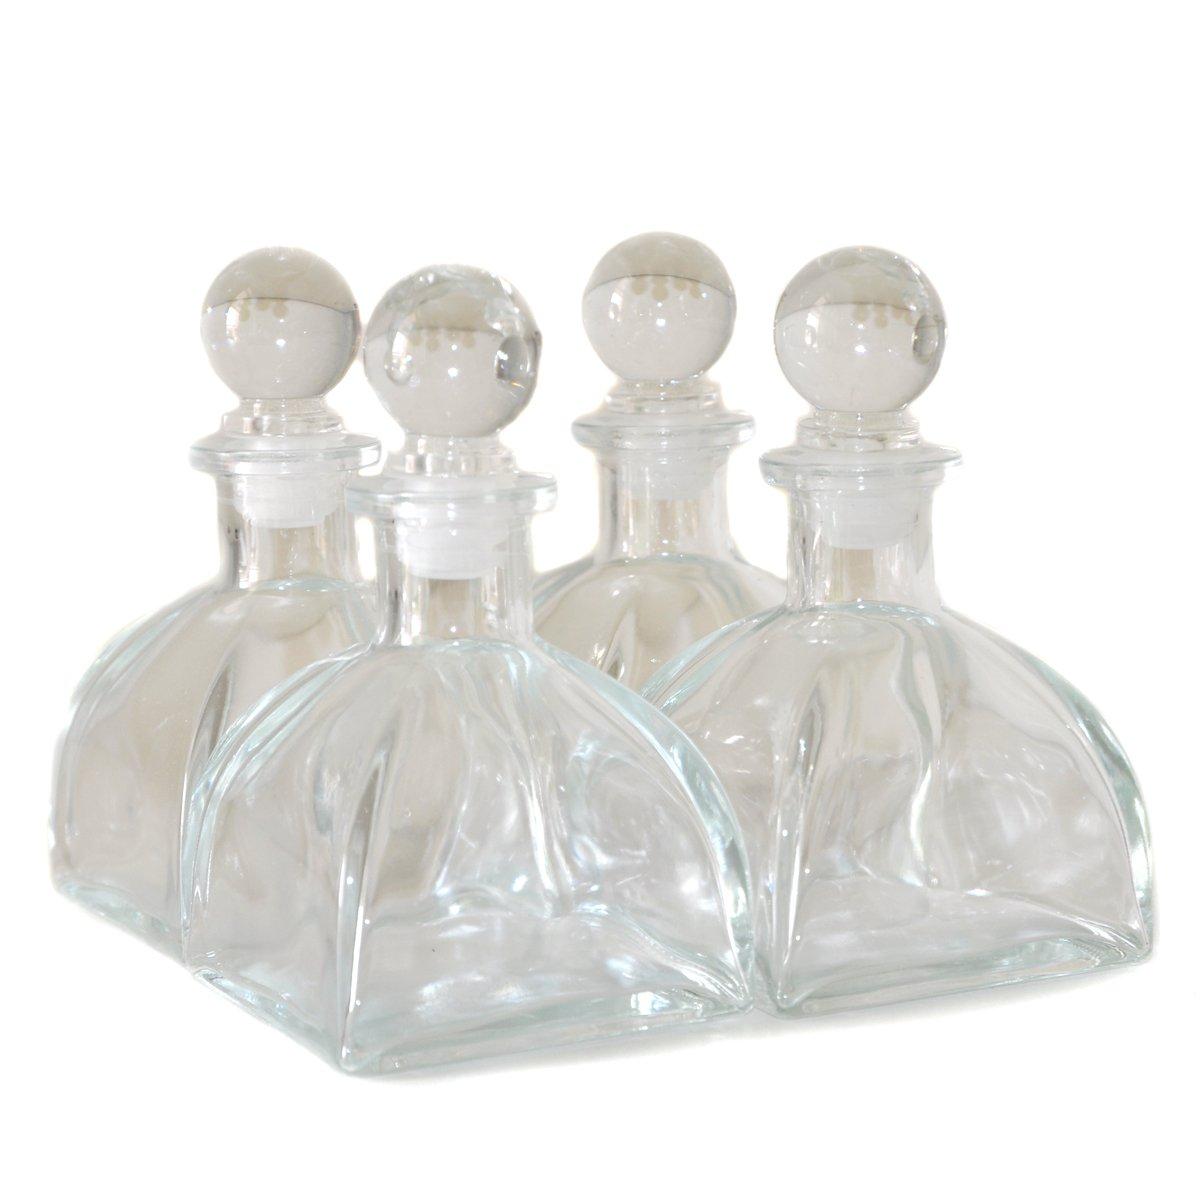 39ed6441e5ec Amazon.com: Ougual Set of 4 Glass Diffuser Bottles 9cm High 150ml ...